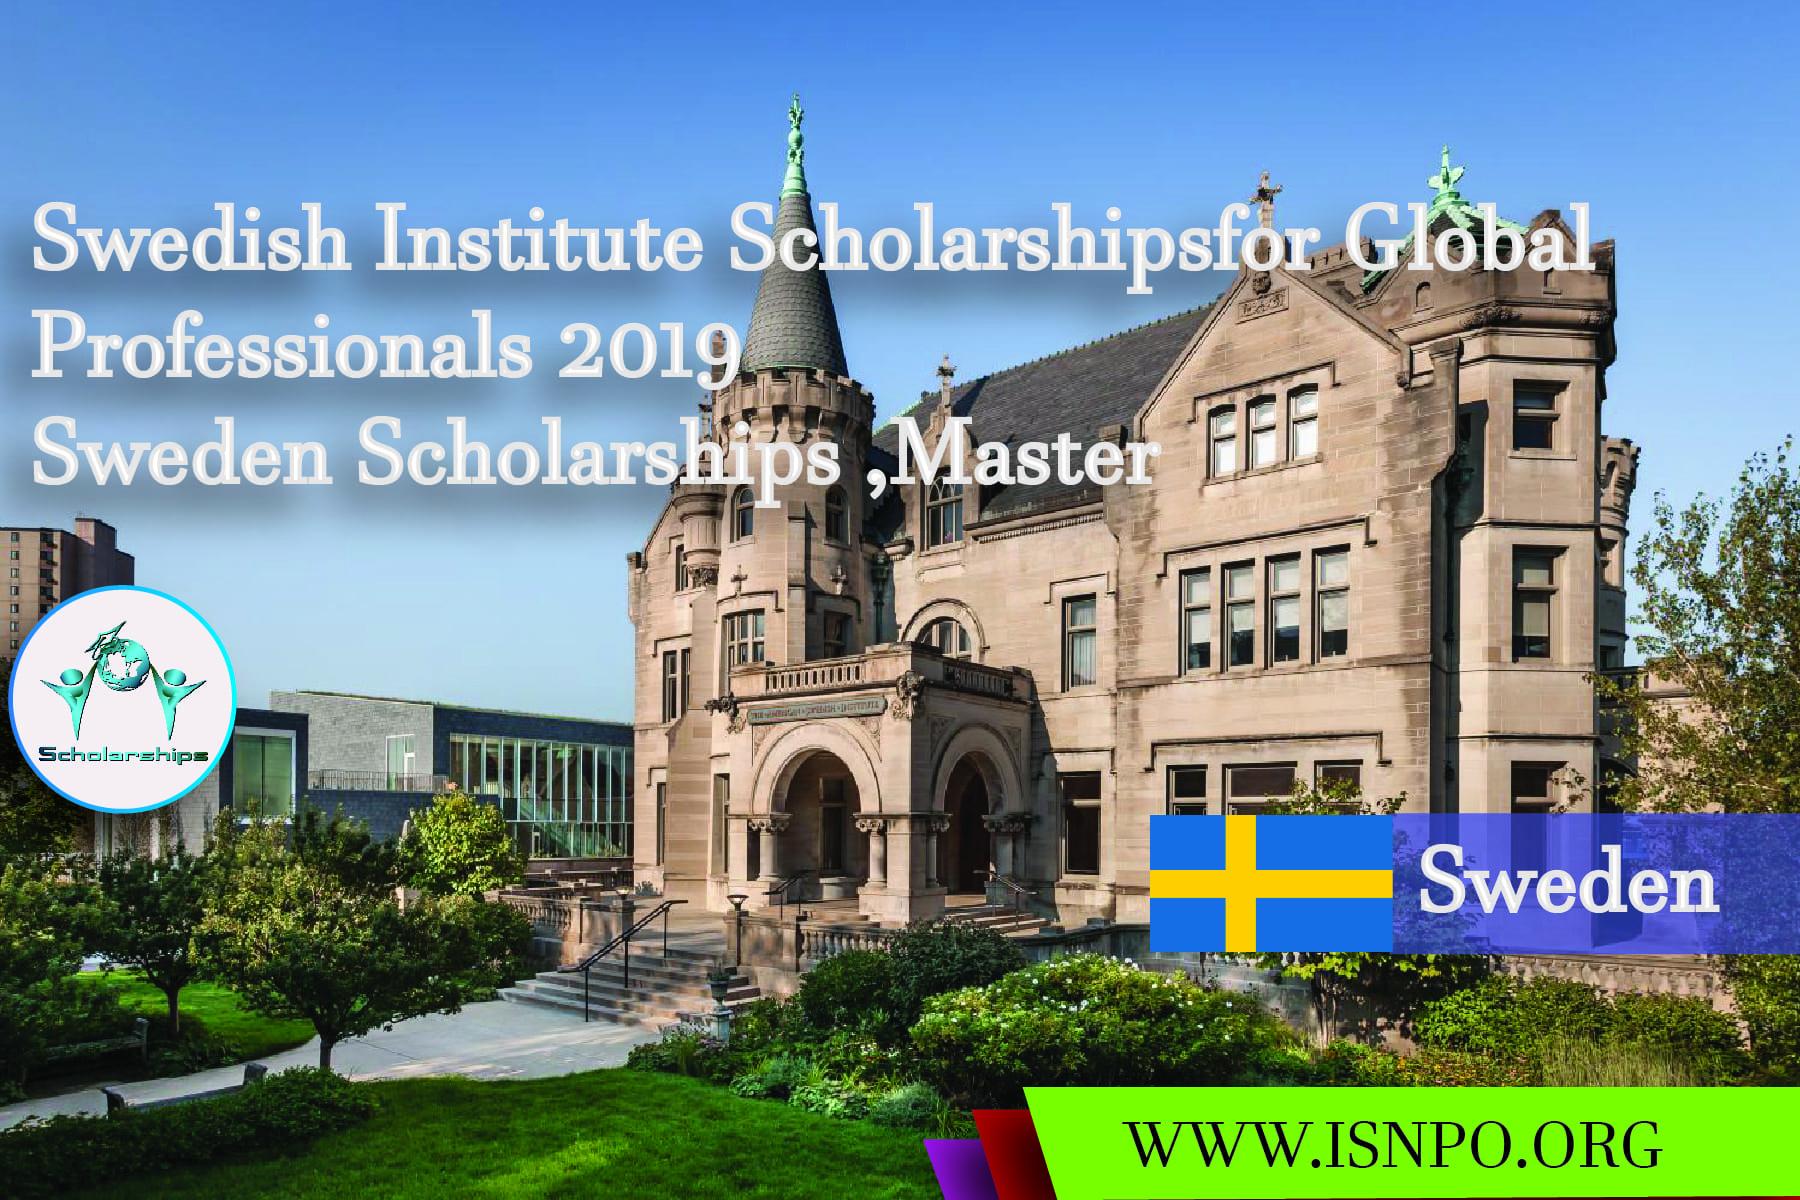 Swedish Institute Scholarships for Global Professionals 2019– Sweden Scholarships